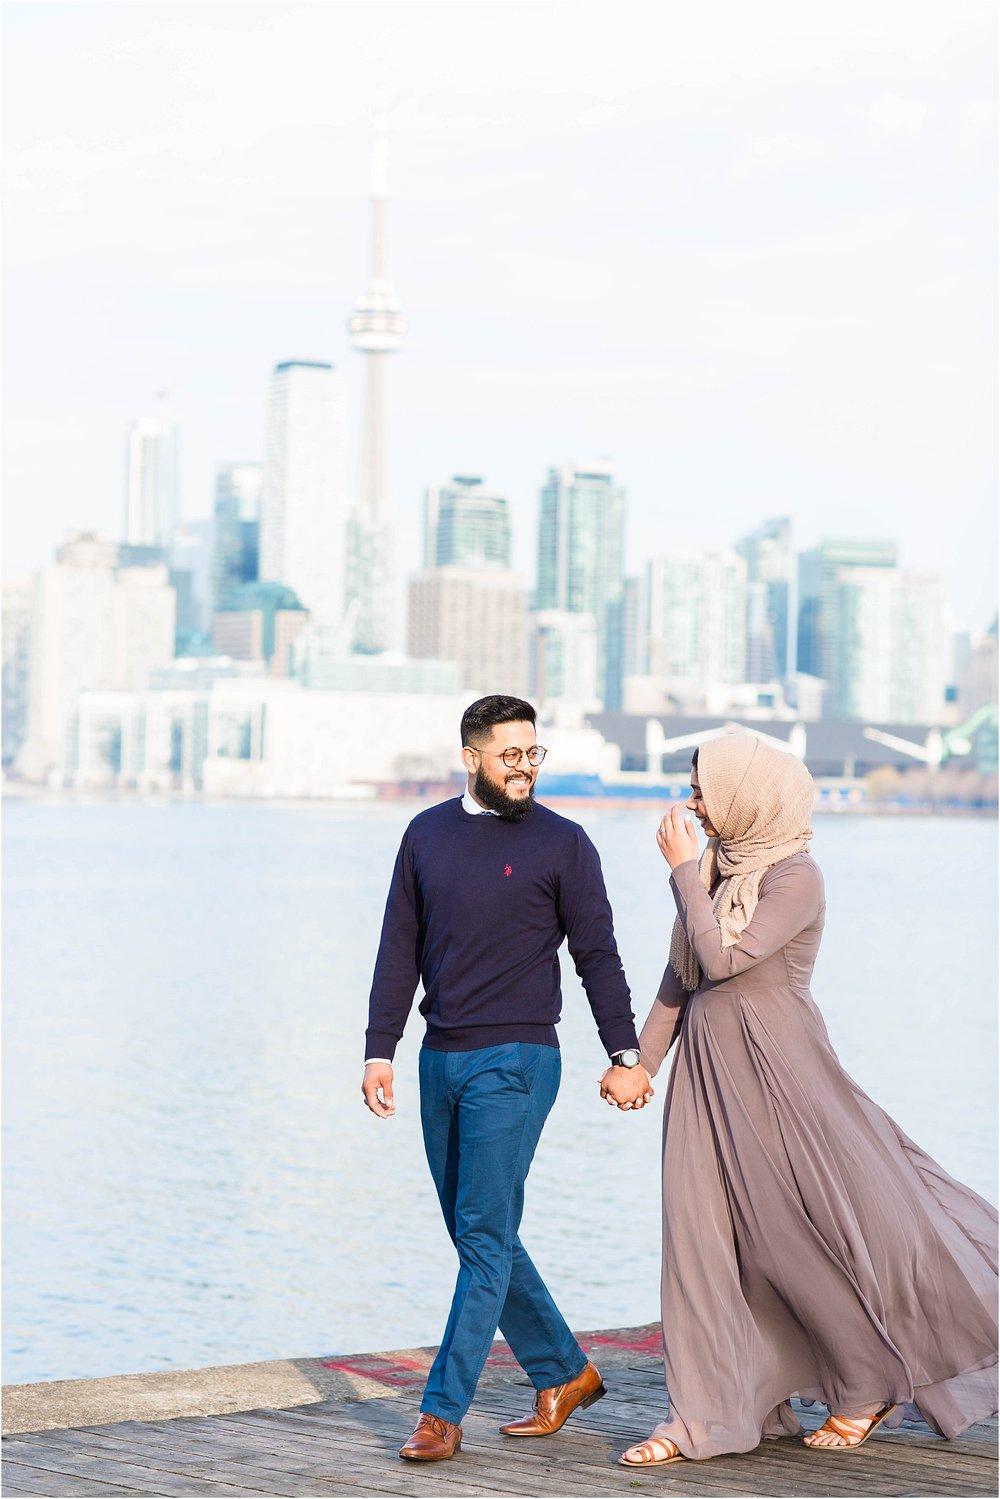 Polson-Pier-Distillery-District-Engagement-Session-Toronto-Mississauga-Brampton-Scarborough-GTA-Pakistani-Indian-Wedding-Engagement-Photographer-Photography_0015.jpg